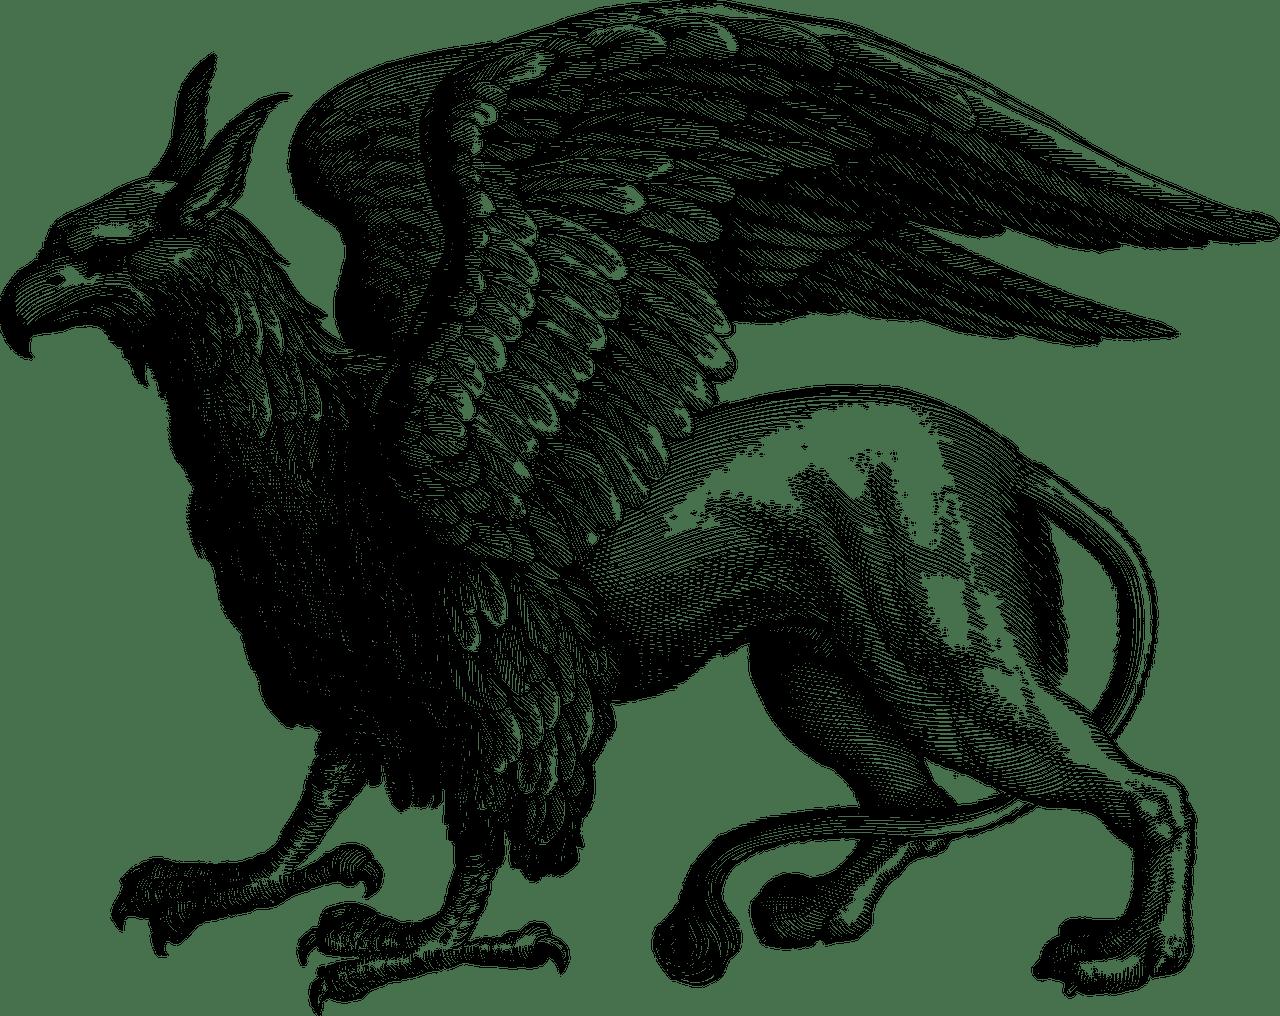 Ziz - Jewish mythical bird